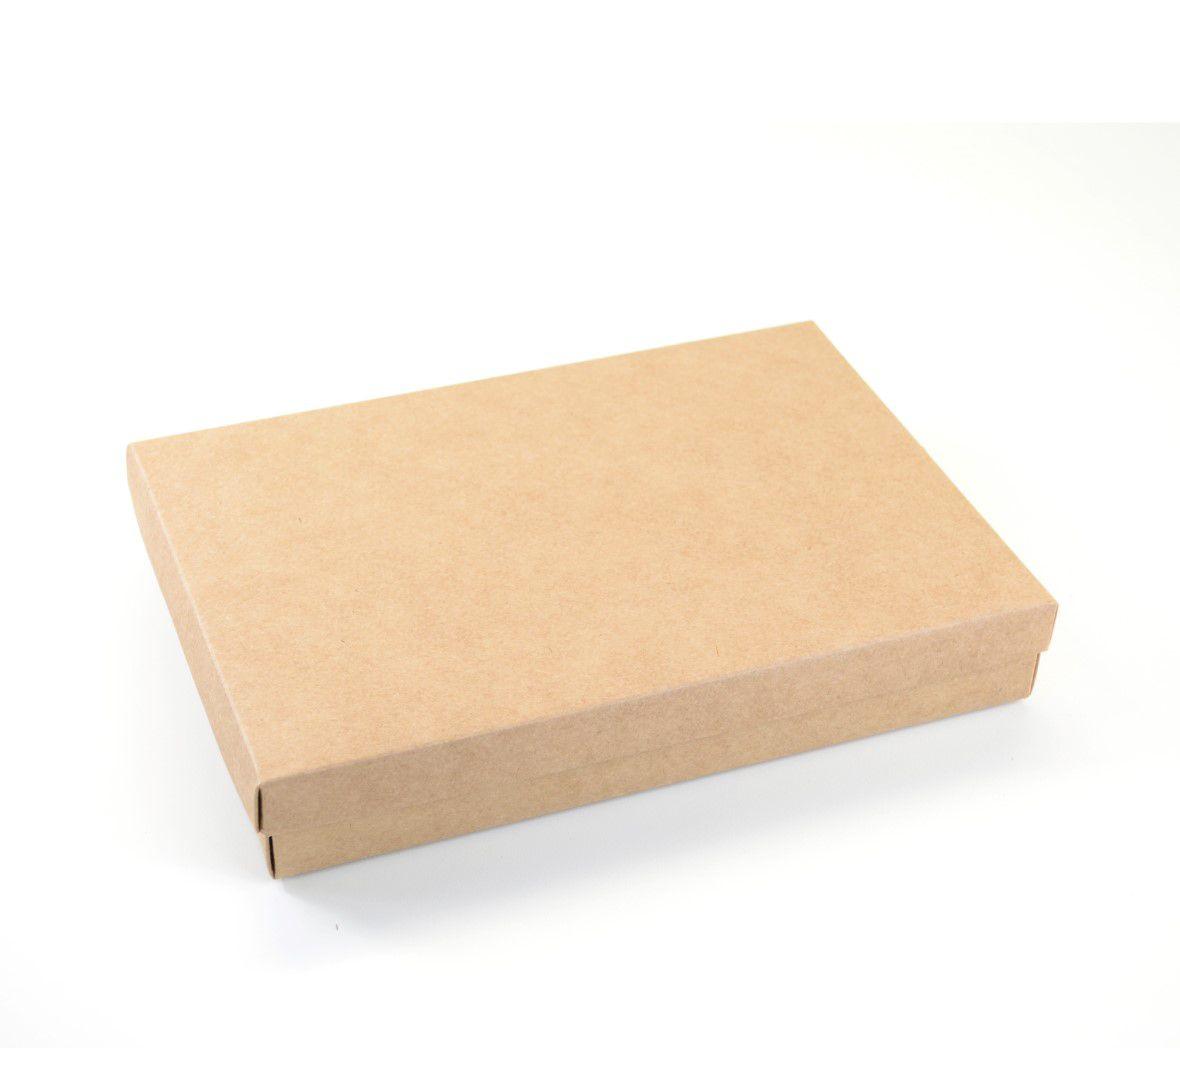 Ref 049 Kraft - Caixa c/ tampa papel - 25x17x4 cm - c/ 10 unidades